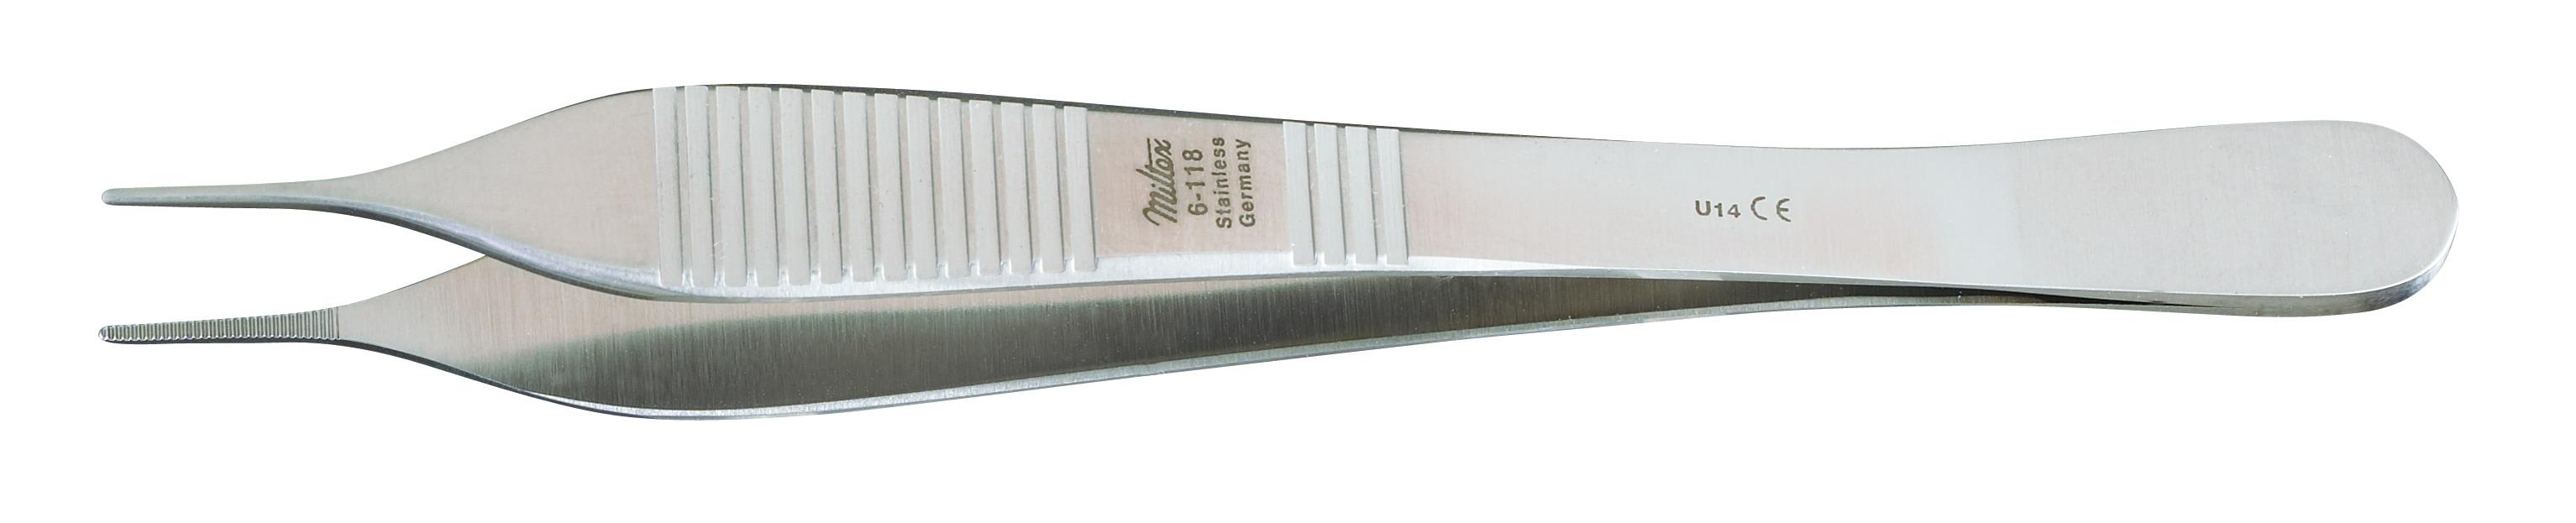 adson-dressing-forceps-4-3-4-121-cm-delicate-serrated-6-118-miltex.jpg